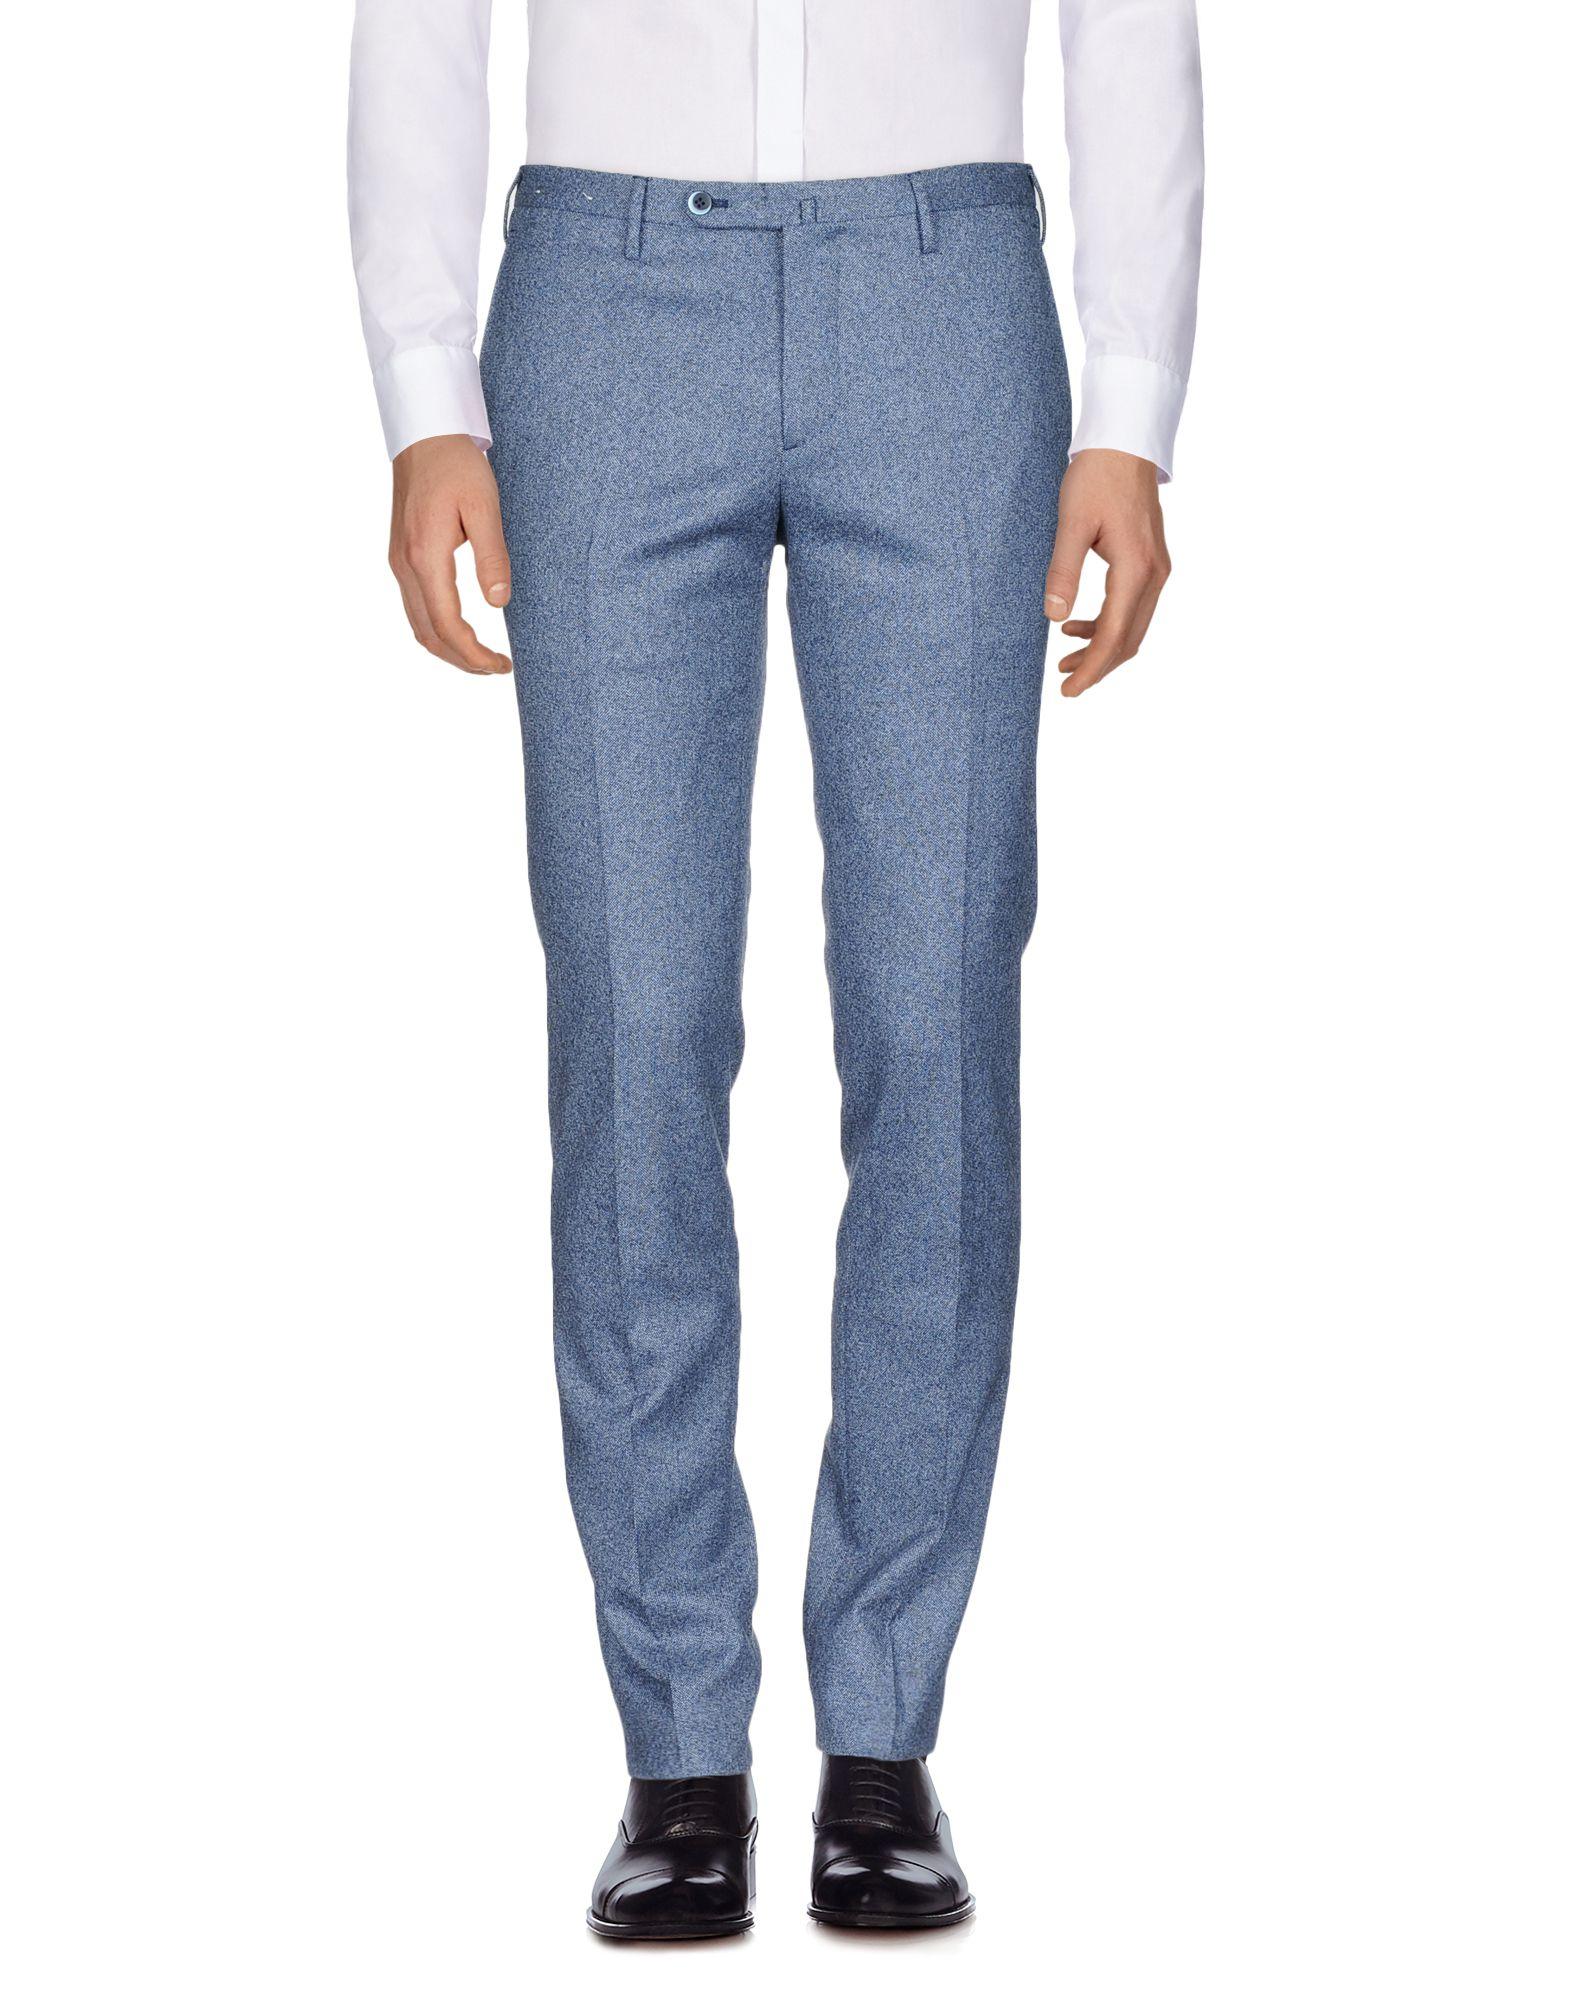 Pantalone G.T.A. Manifattura Pantaloni Donna - Acquista online su